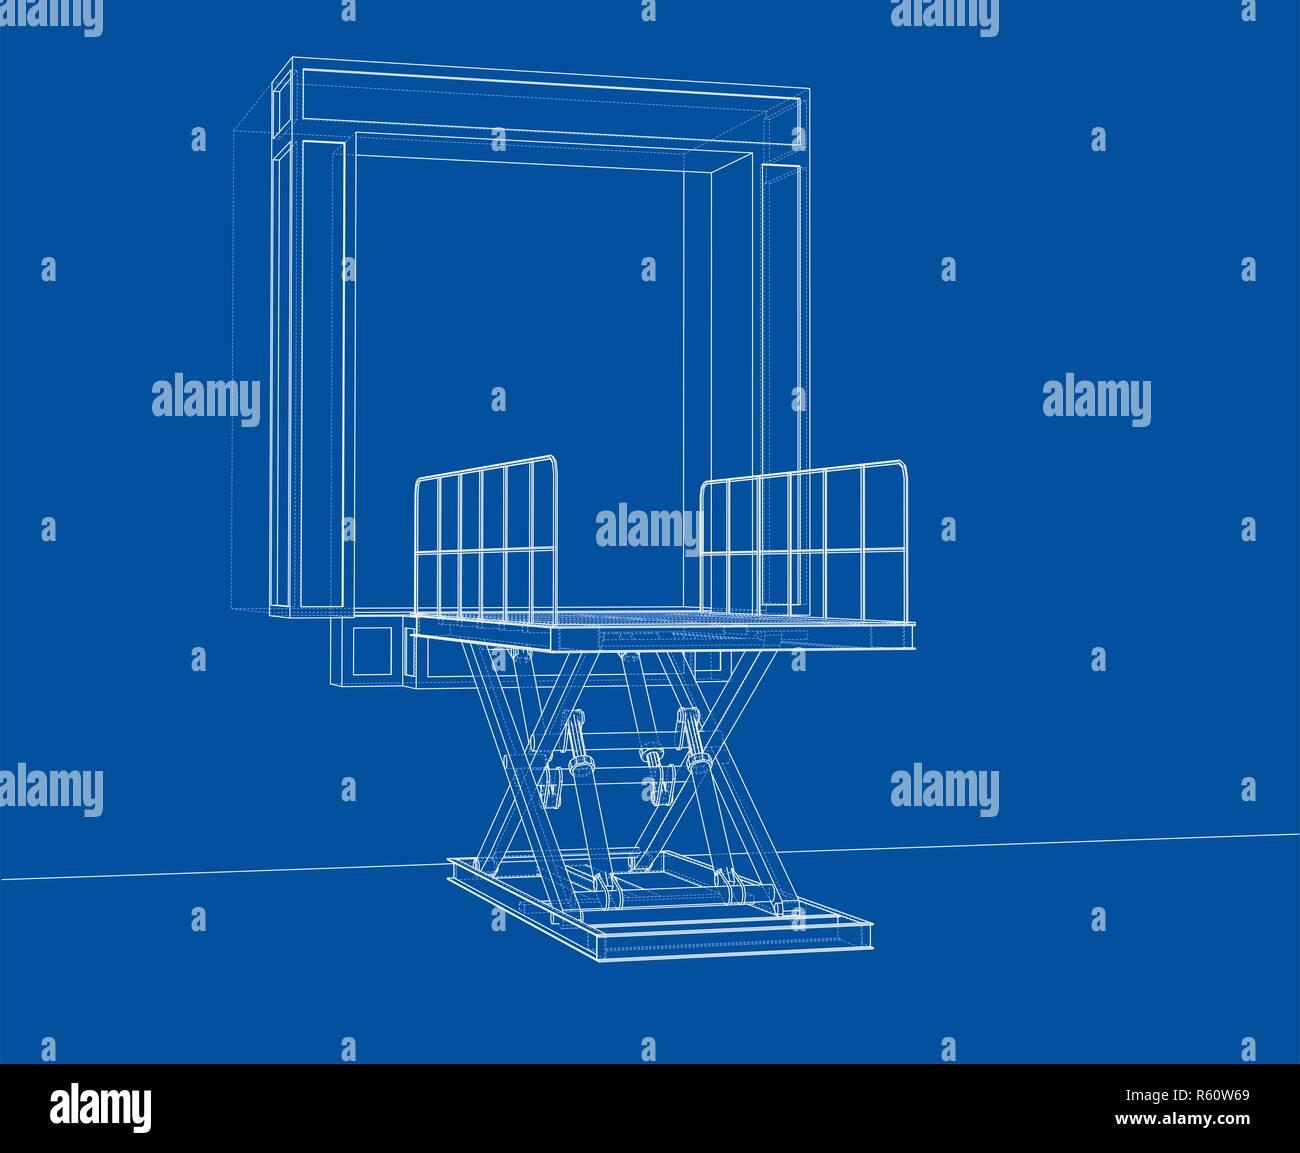 hight resolution of dock leveler concept stock image